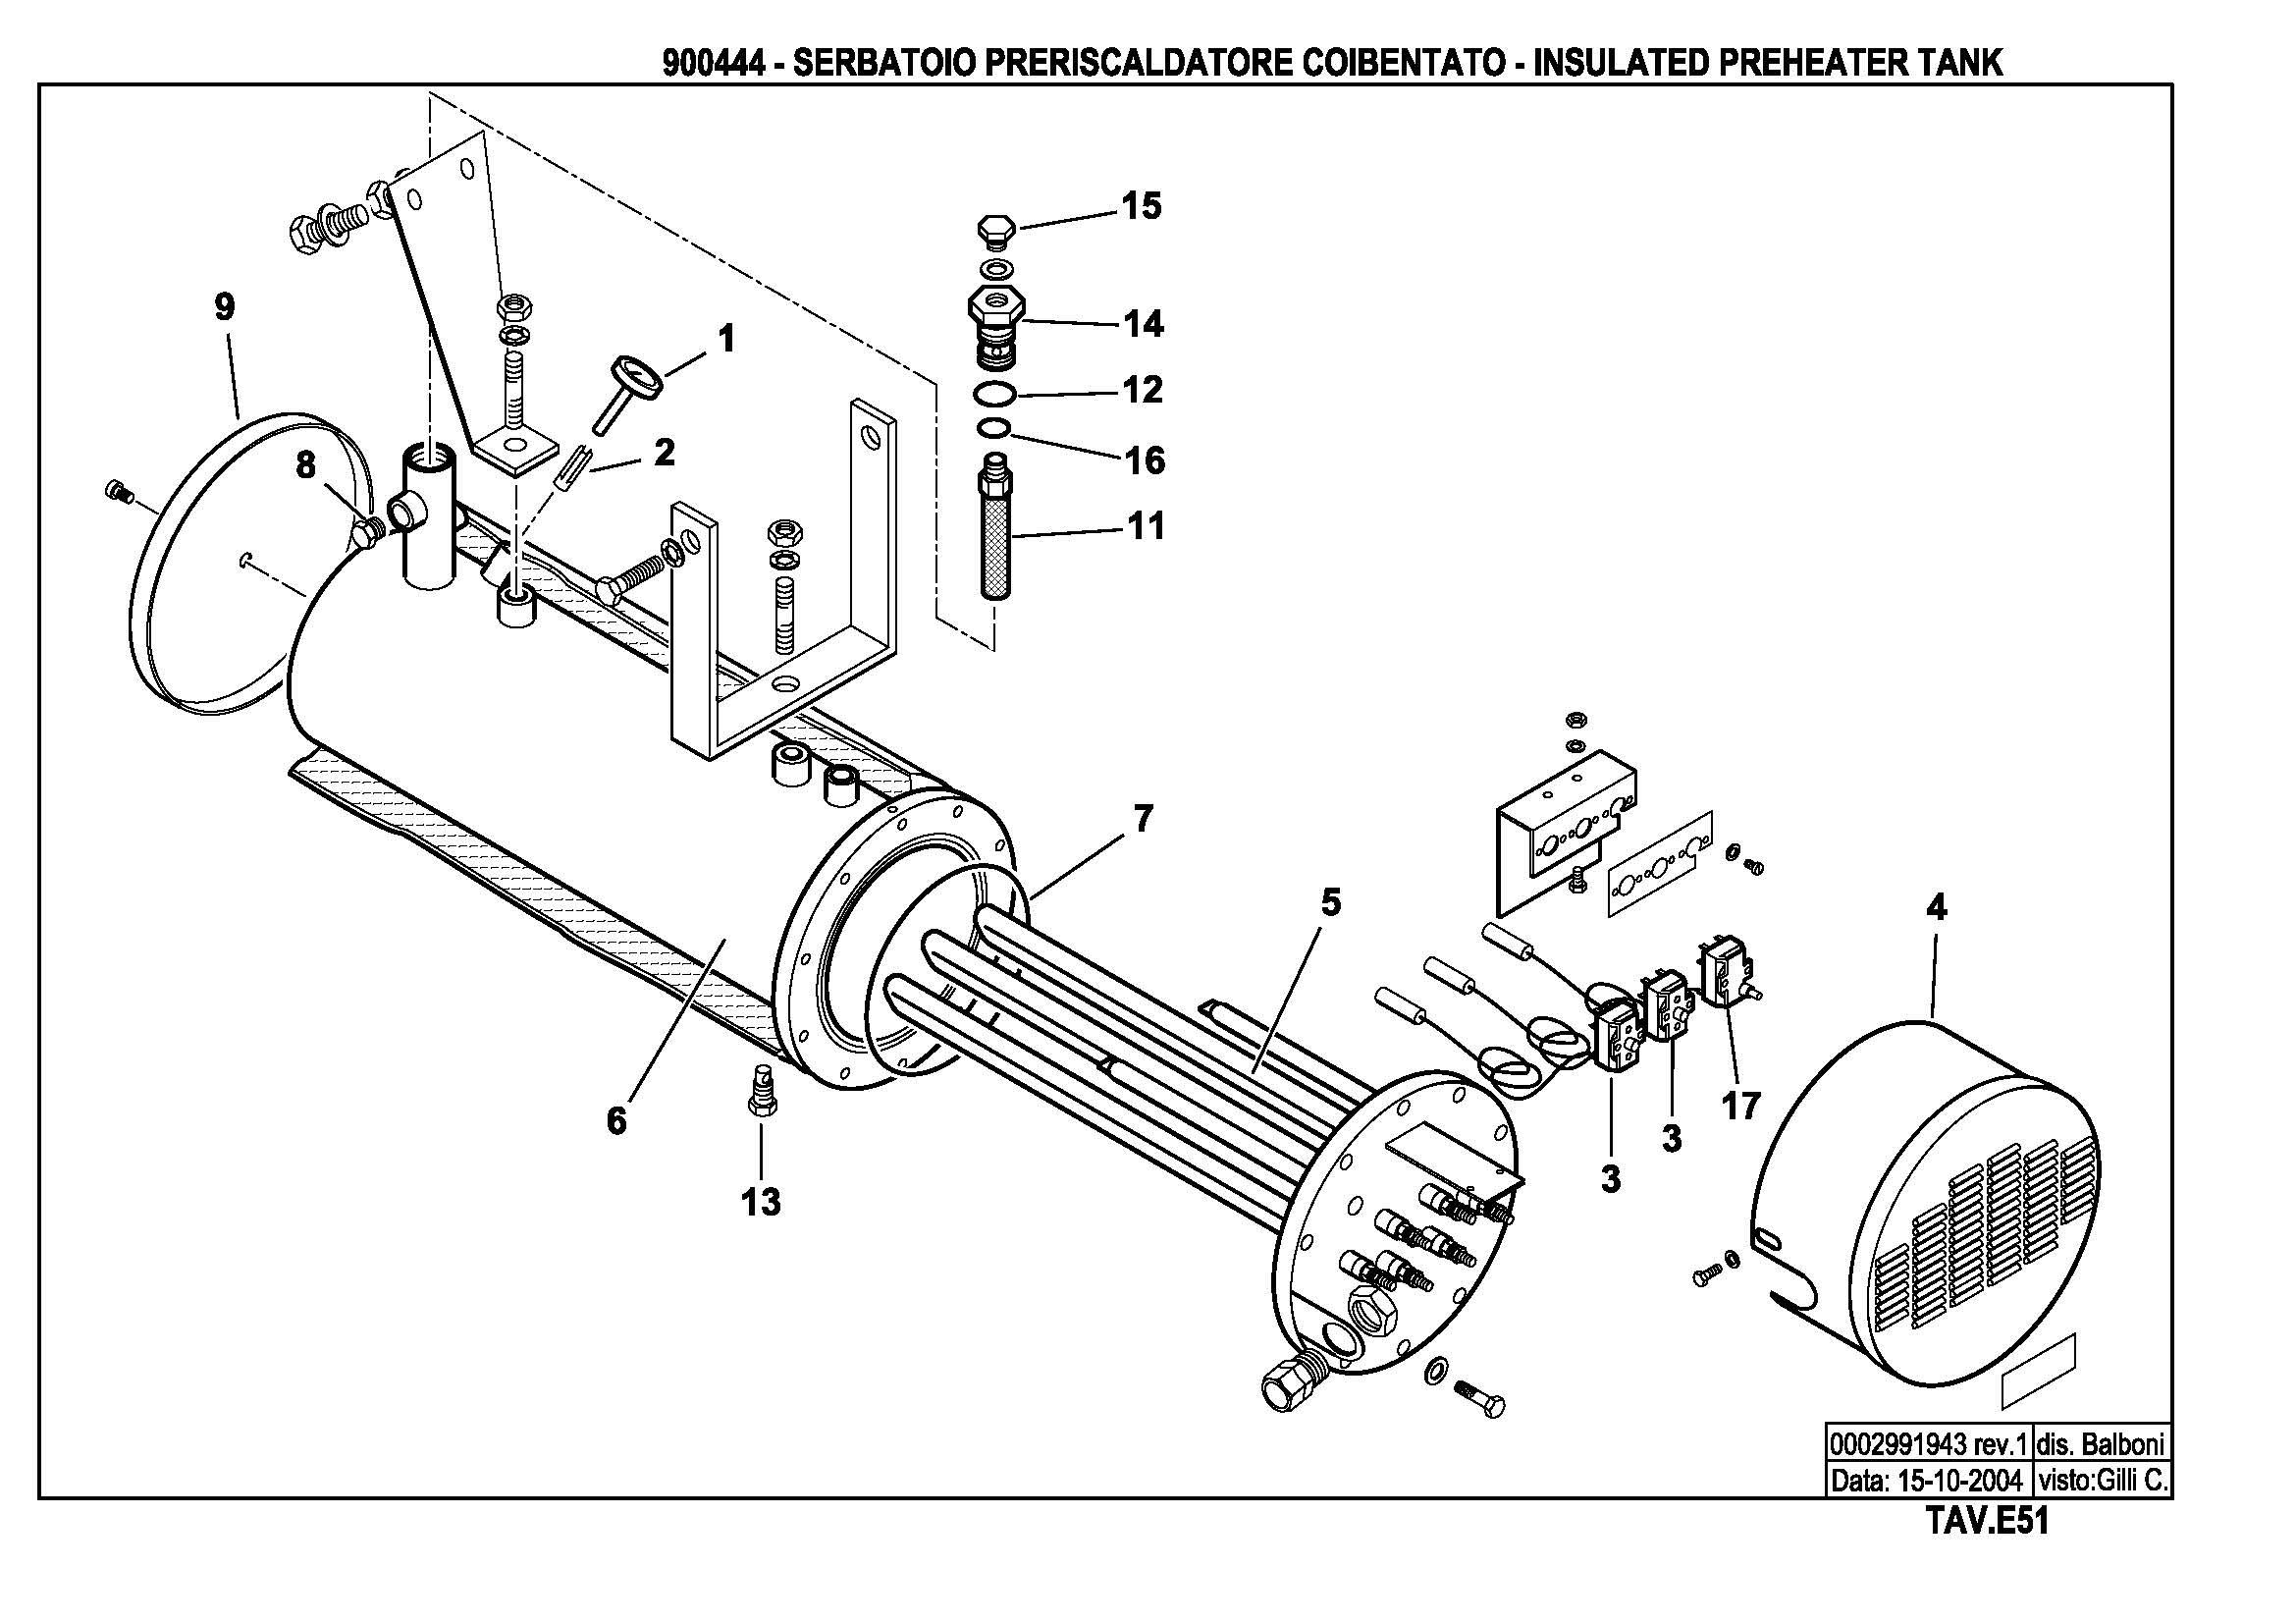 Подогреватель жидкого топлива E51 900444 1 20041015